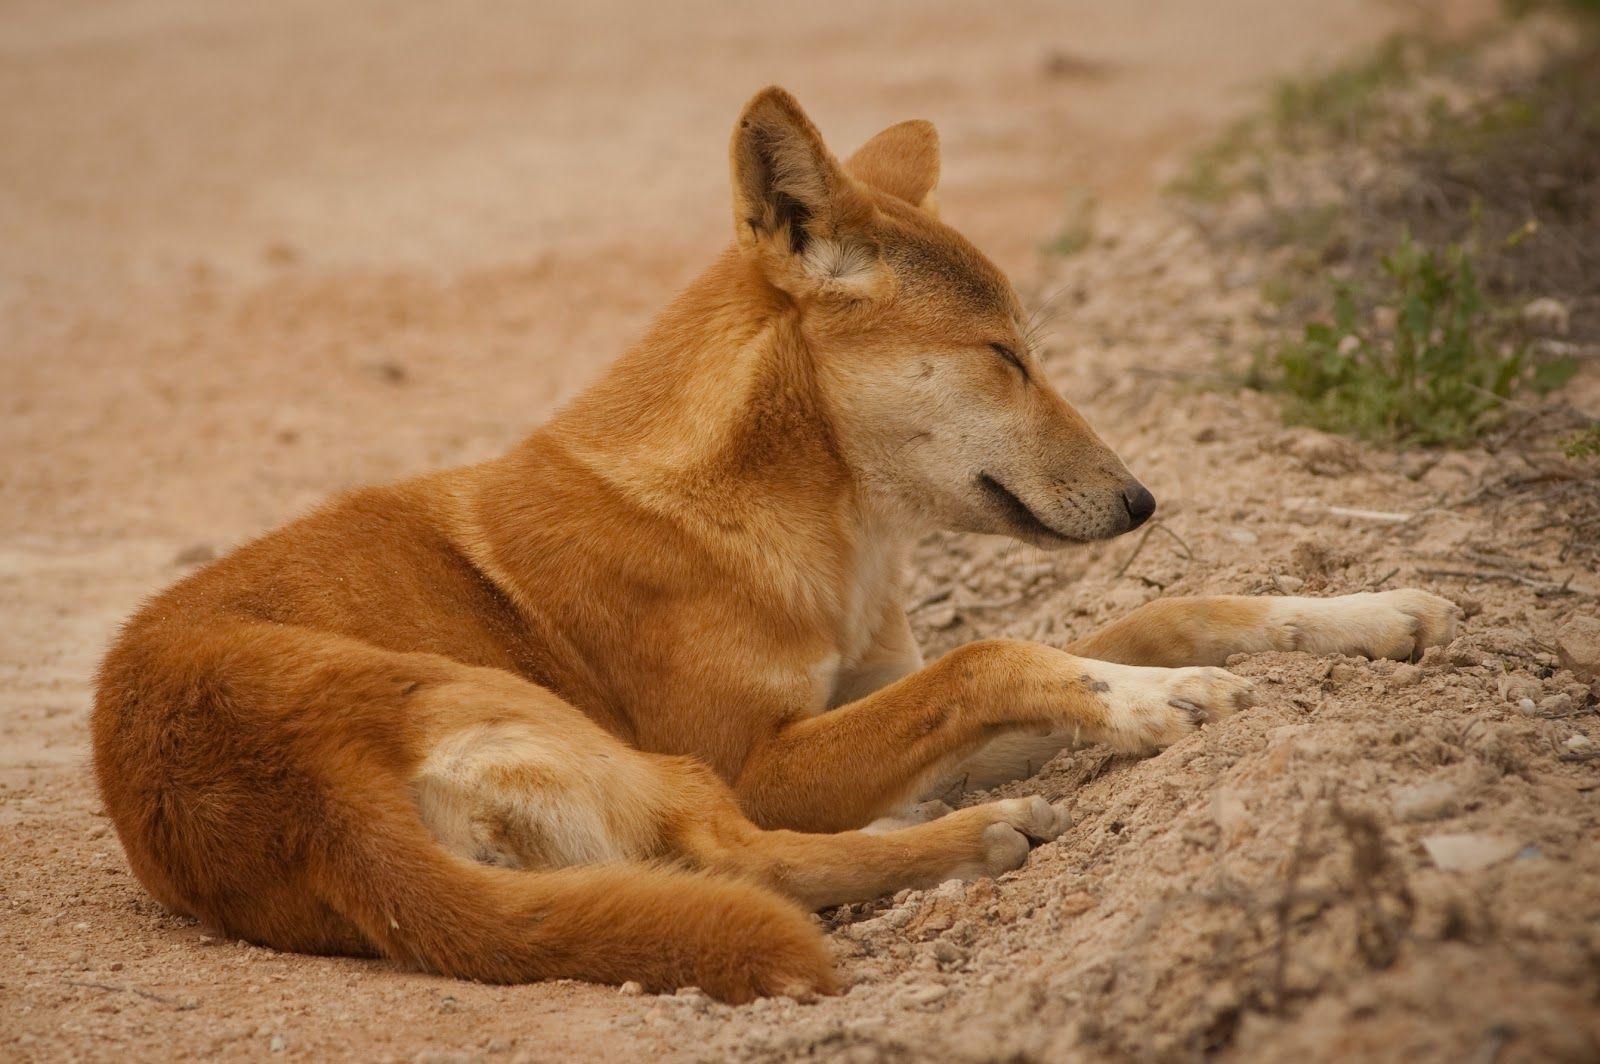 dingo Dingo The Life of Animals Dogs, Australian